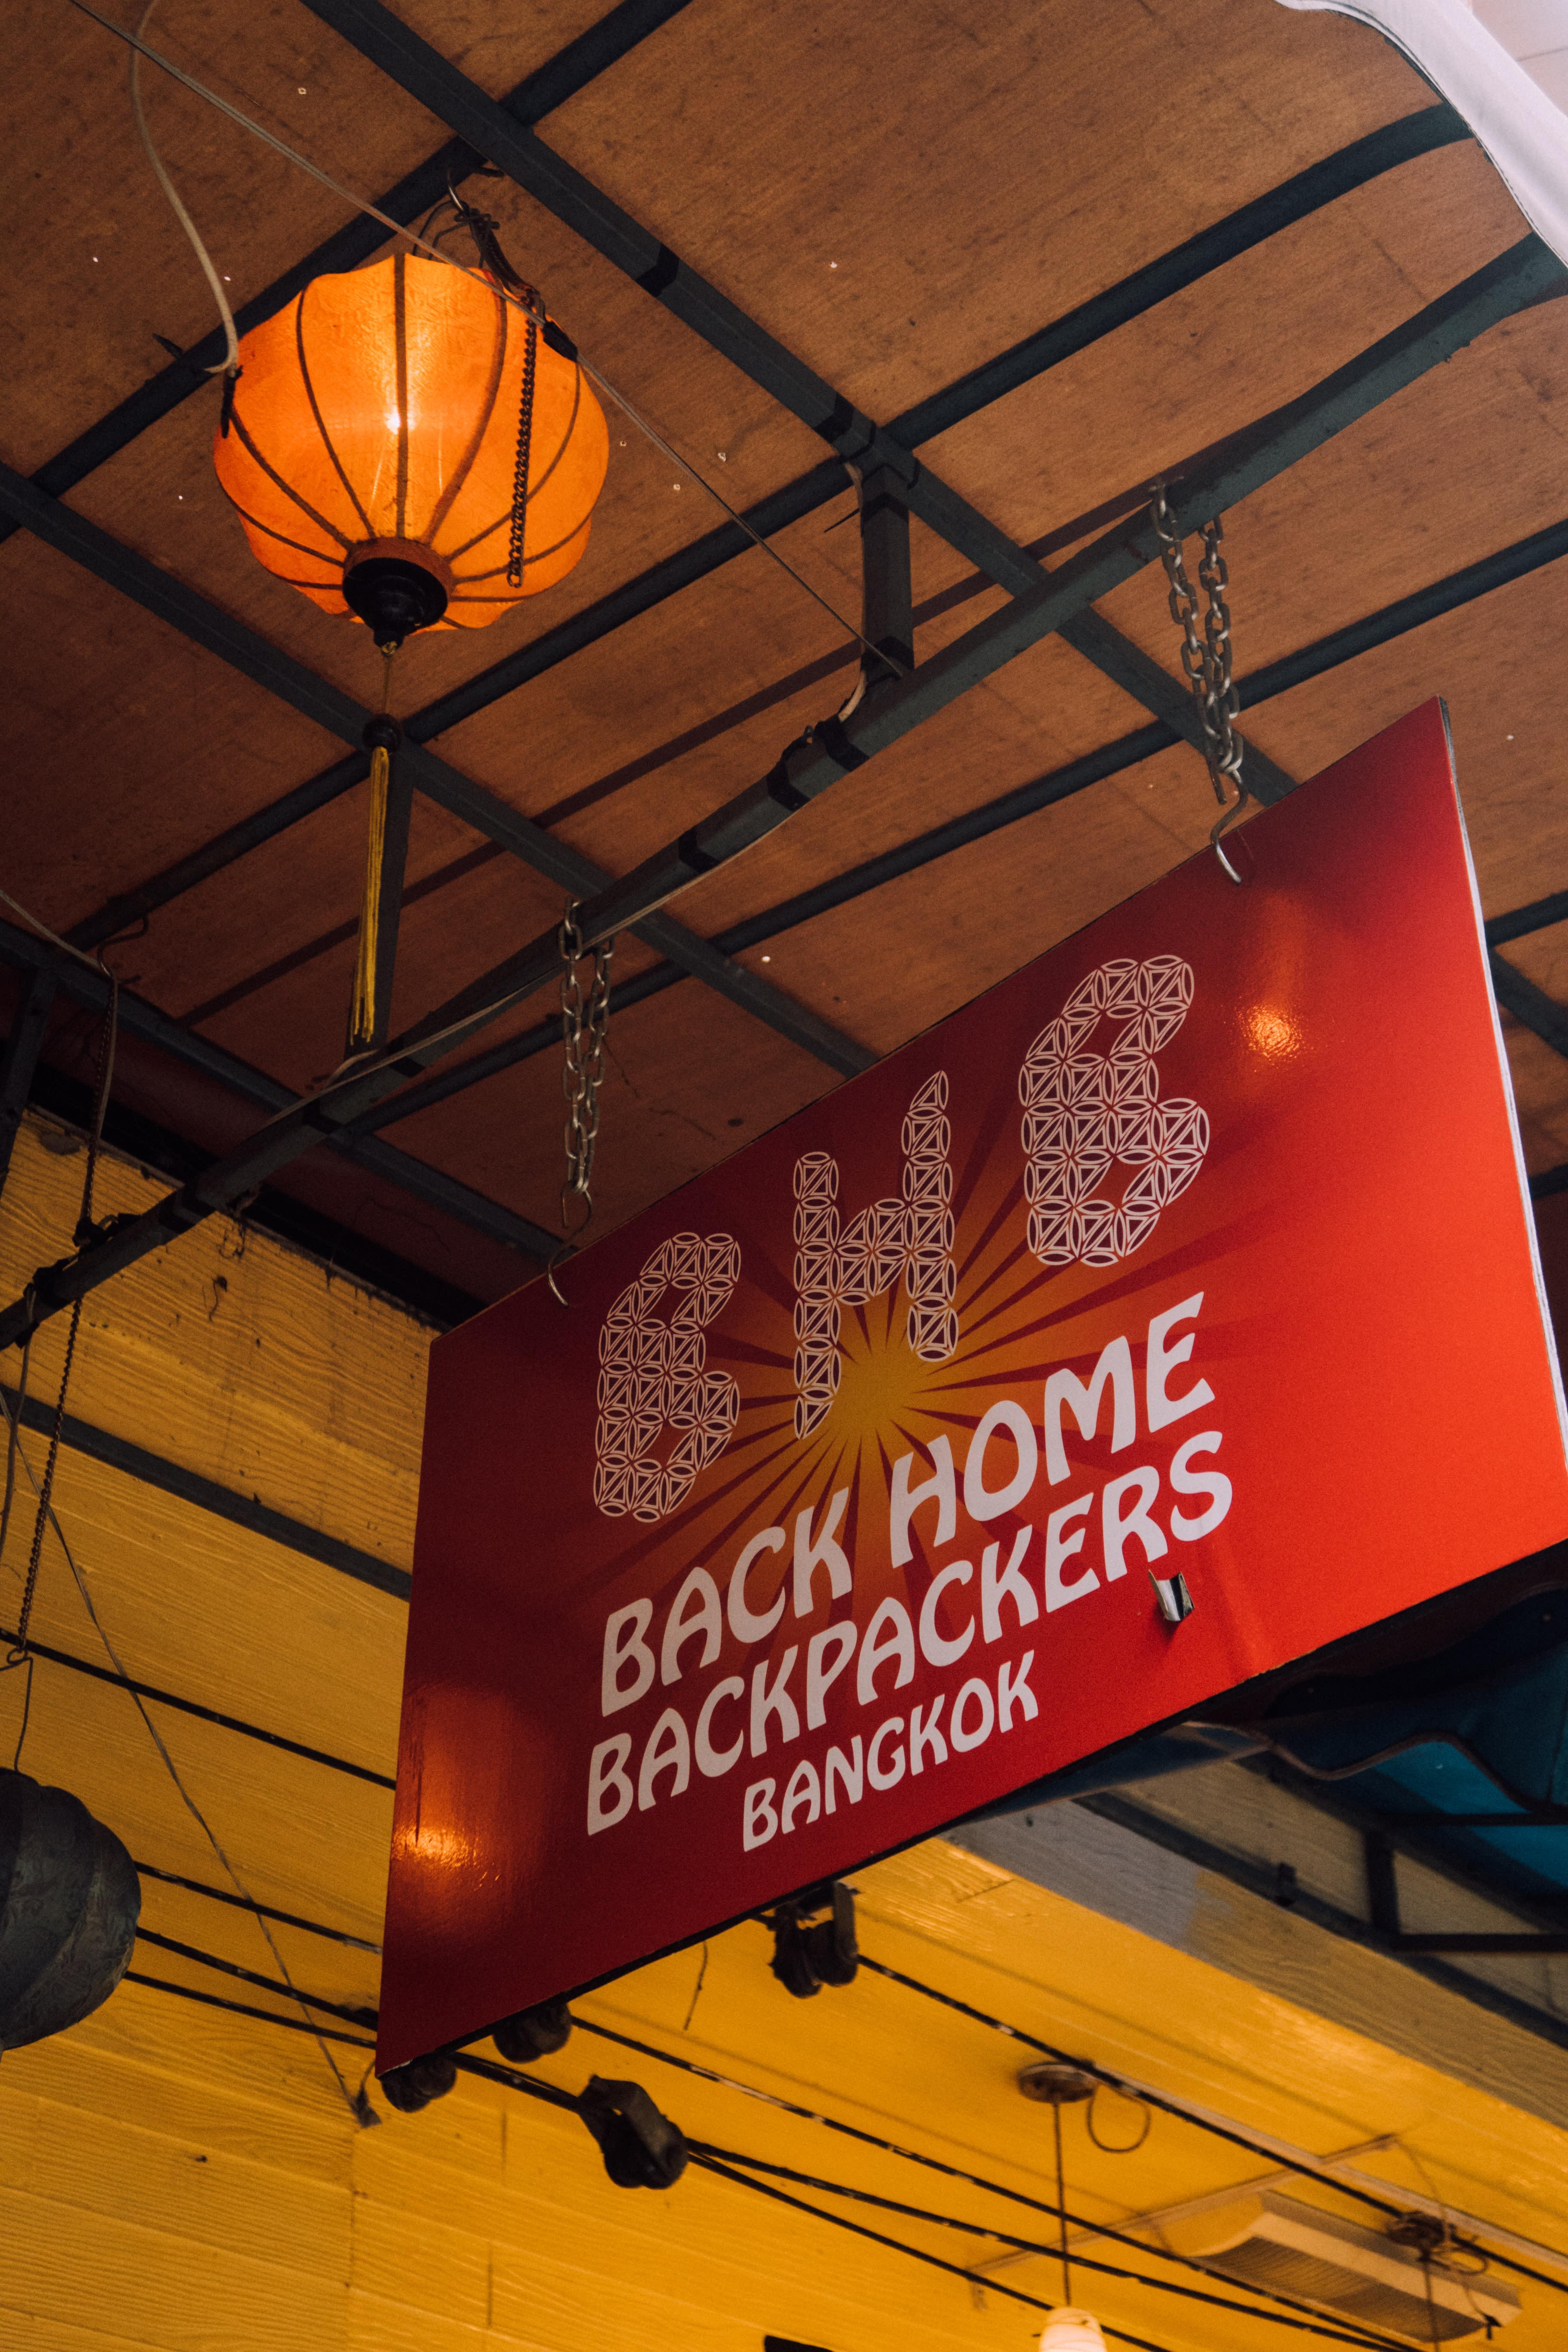 Back Home Backpackers